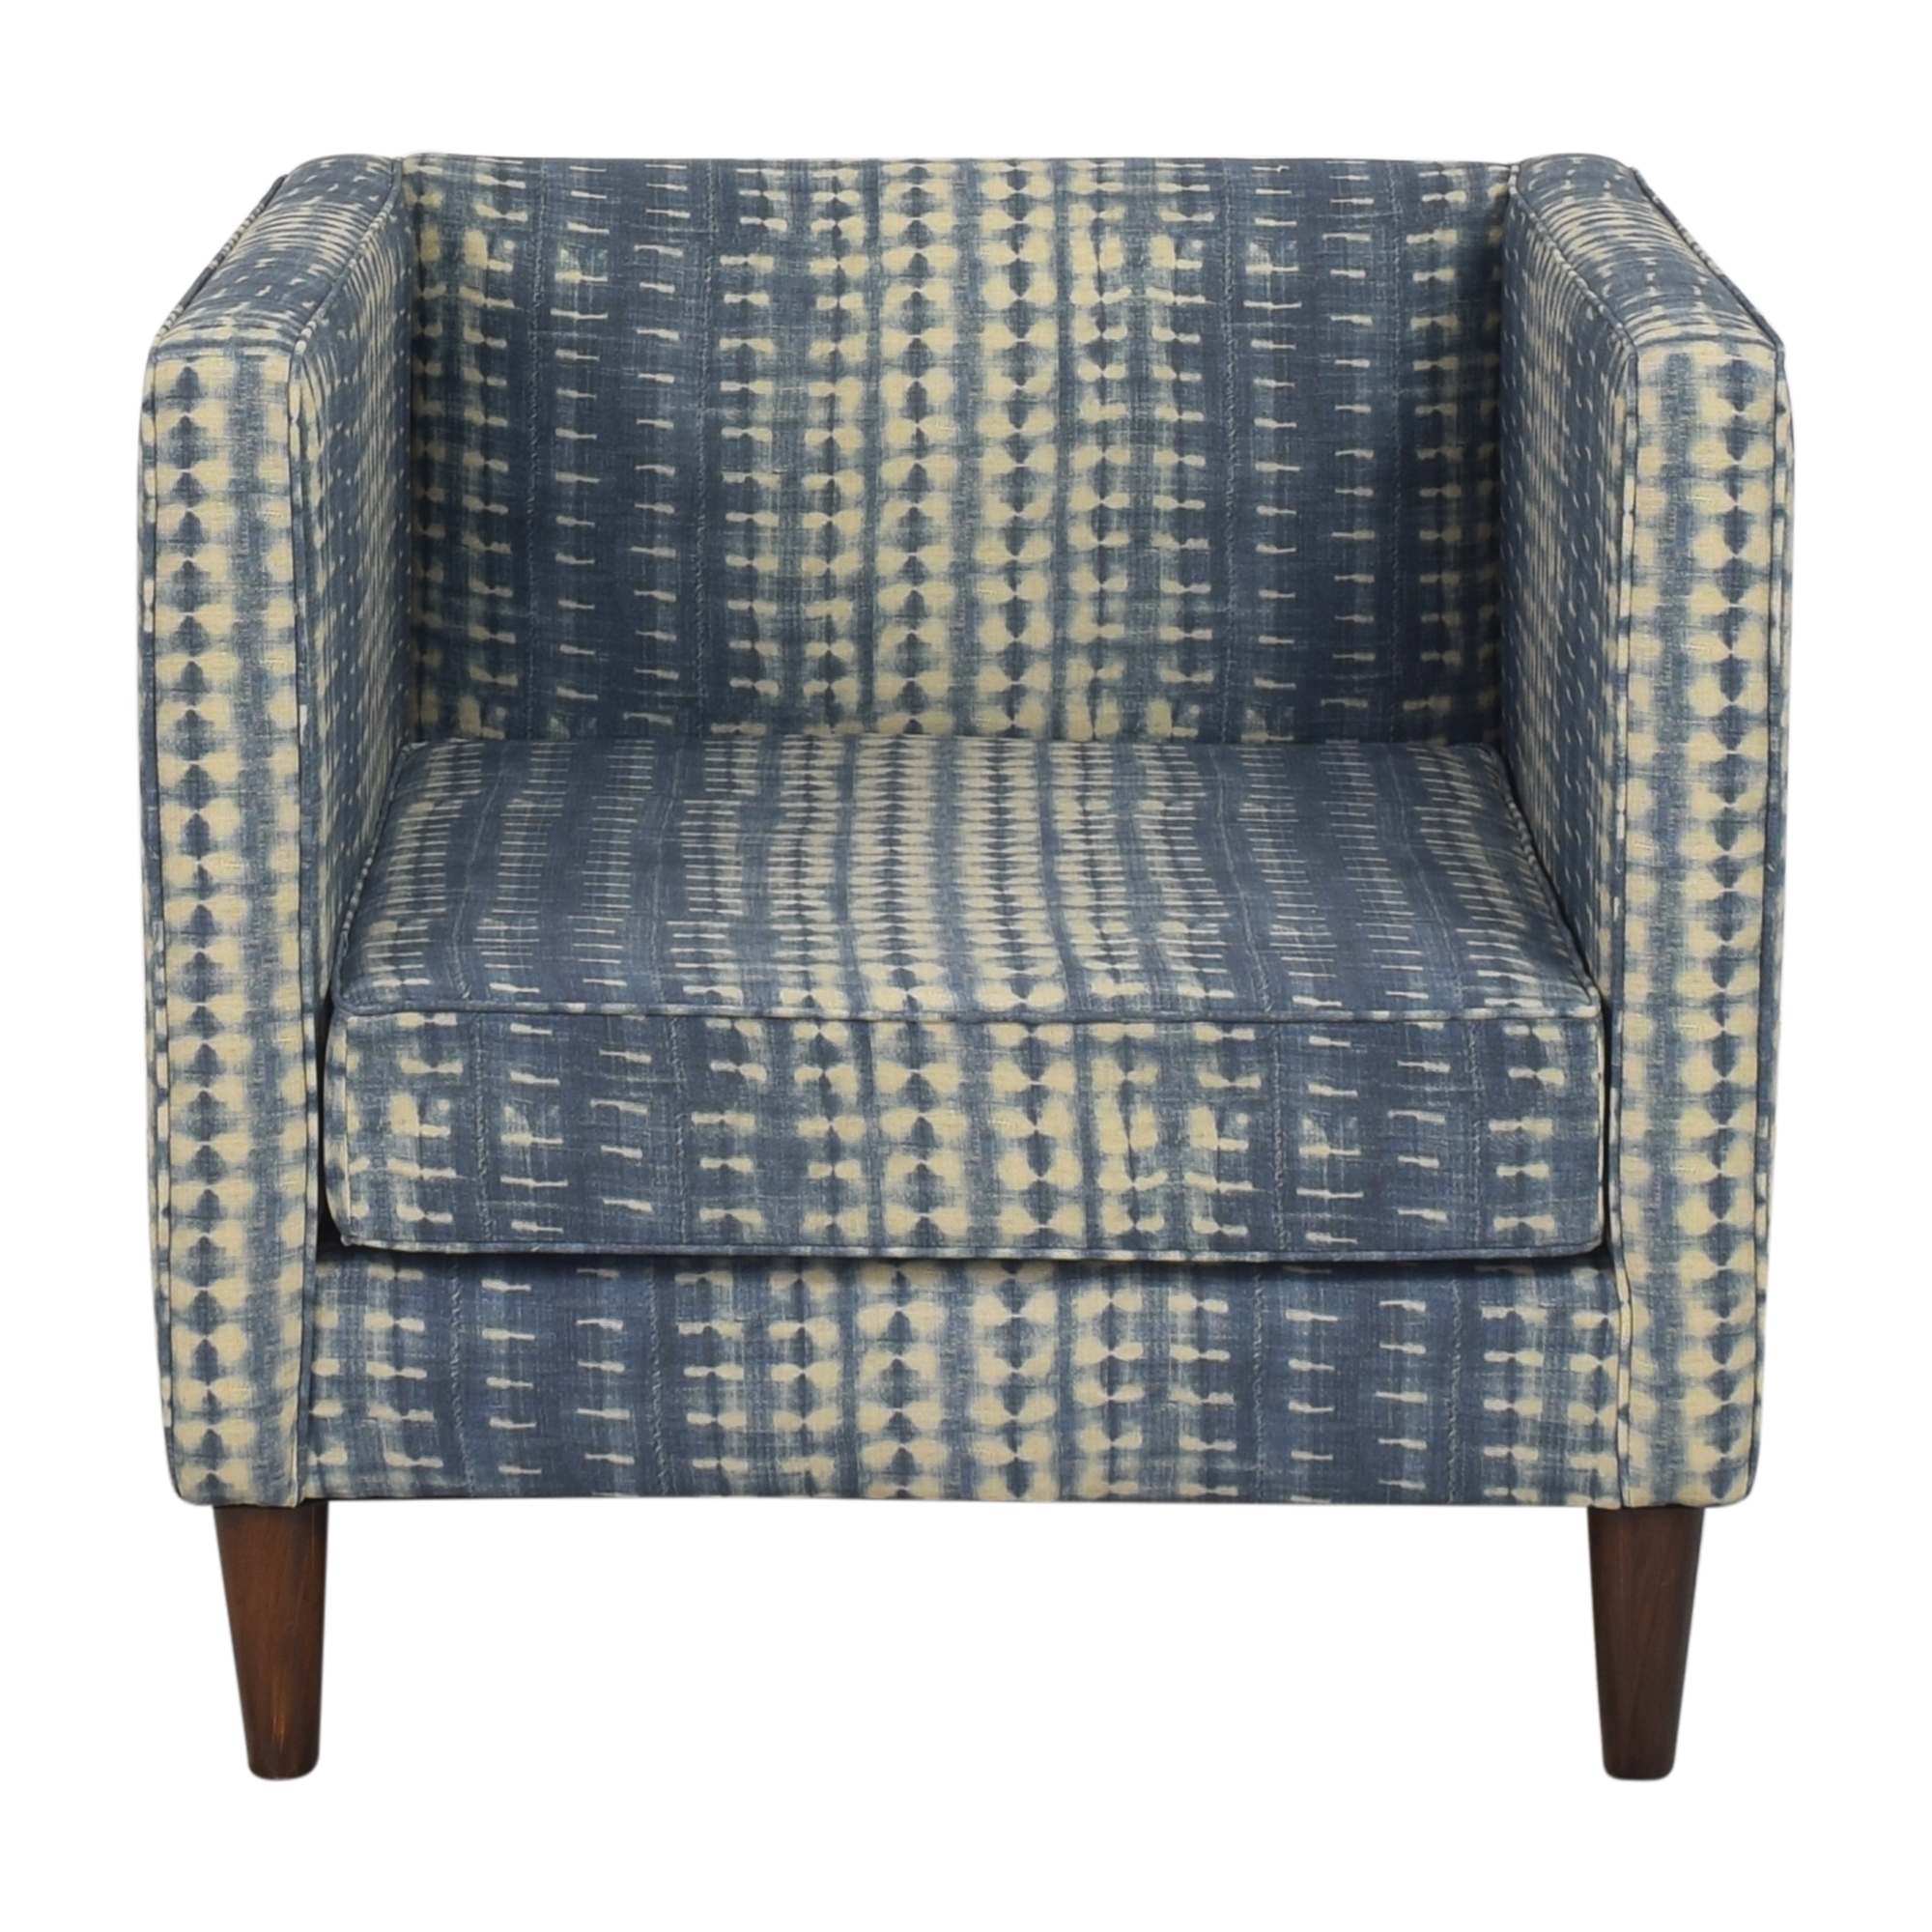 The Inside The Inside Tuxedo Chair ma